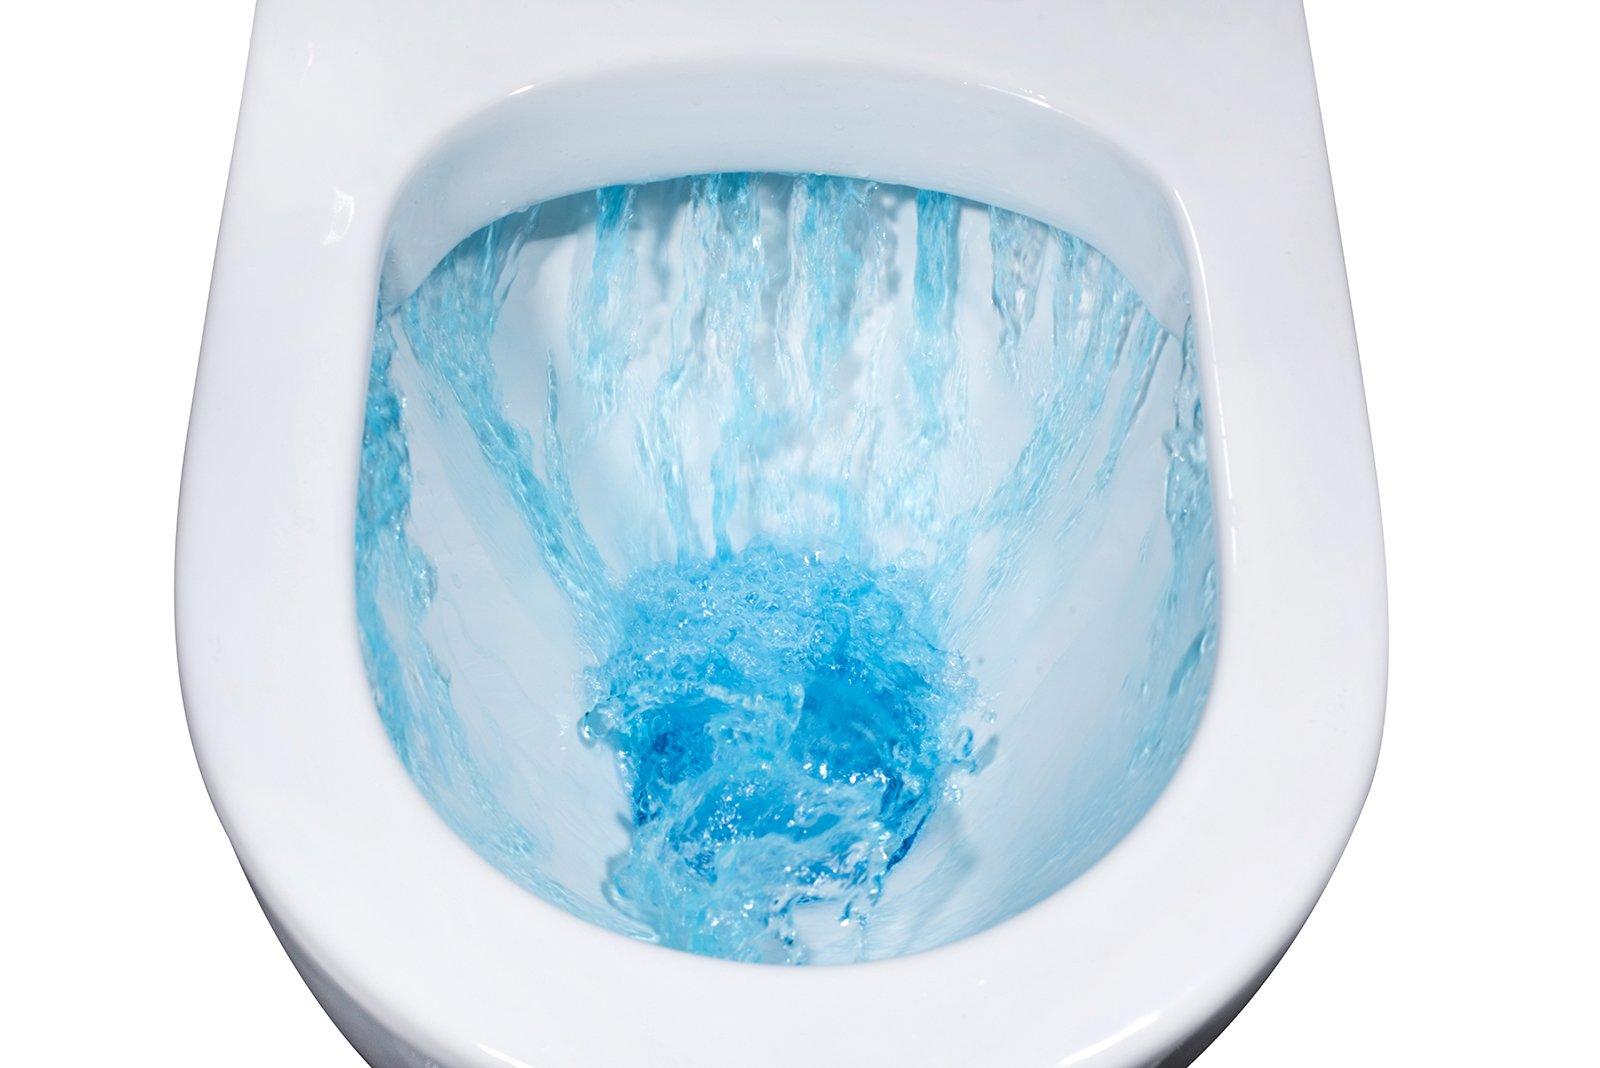 Spülrandloses Wand-Hänge WC B-8030R Weiß - mit Nano-Beschichtung - inkl. Softclose-Deckel zoom thumbnail 3